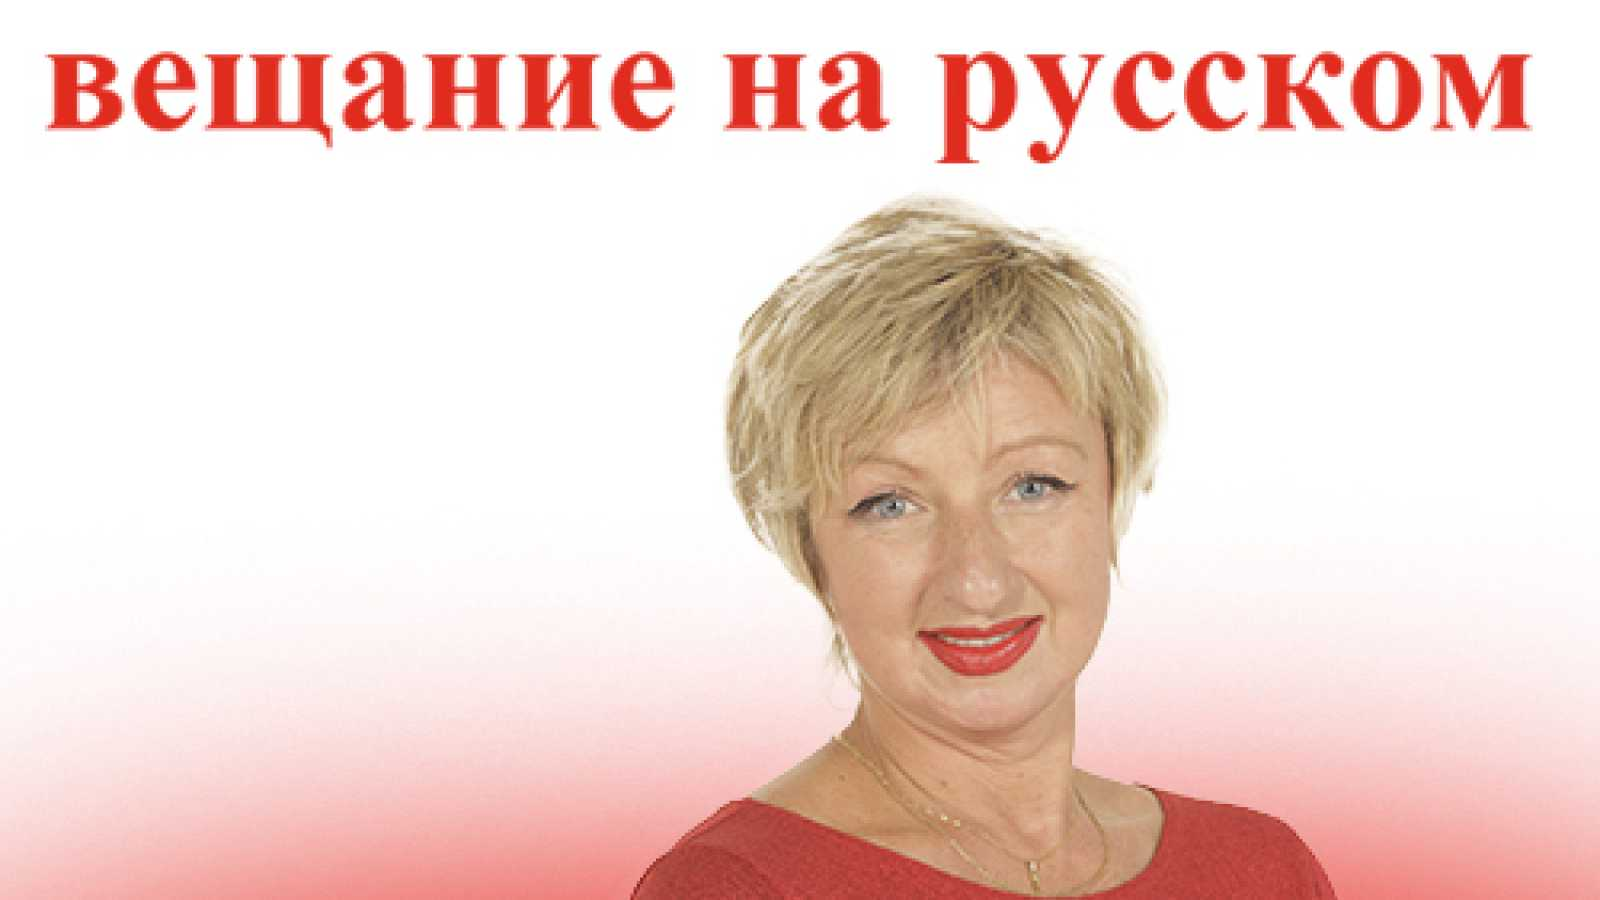 Emisión en ruso - Carmen Claudín: pro Moskvy, Minsk i ispánskuyu Perestroiky... - 03/02/21 - escuchar ahora